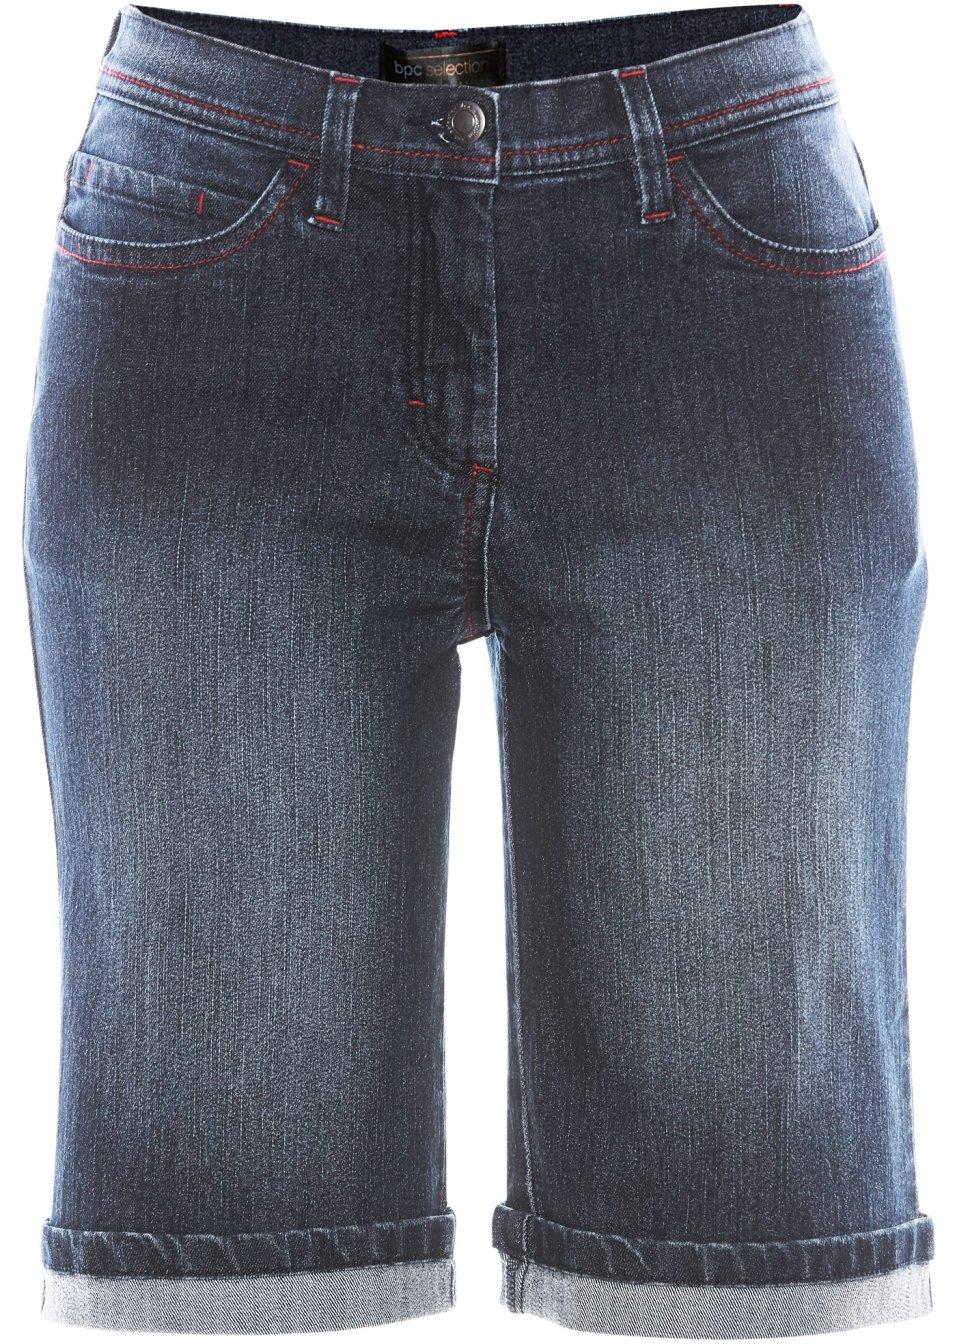 Jeans-Bermuda dark denim - bpc selection online bestellen - bonprix.de KToNG EYMQC